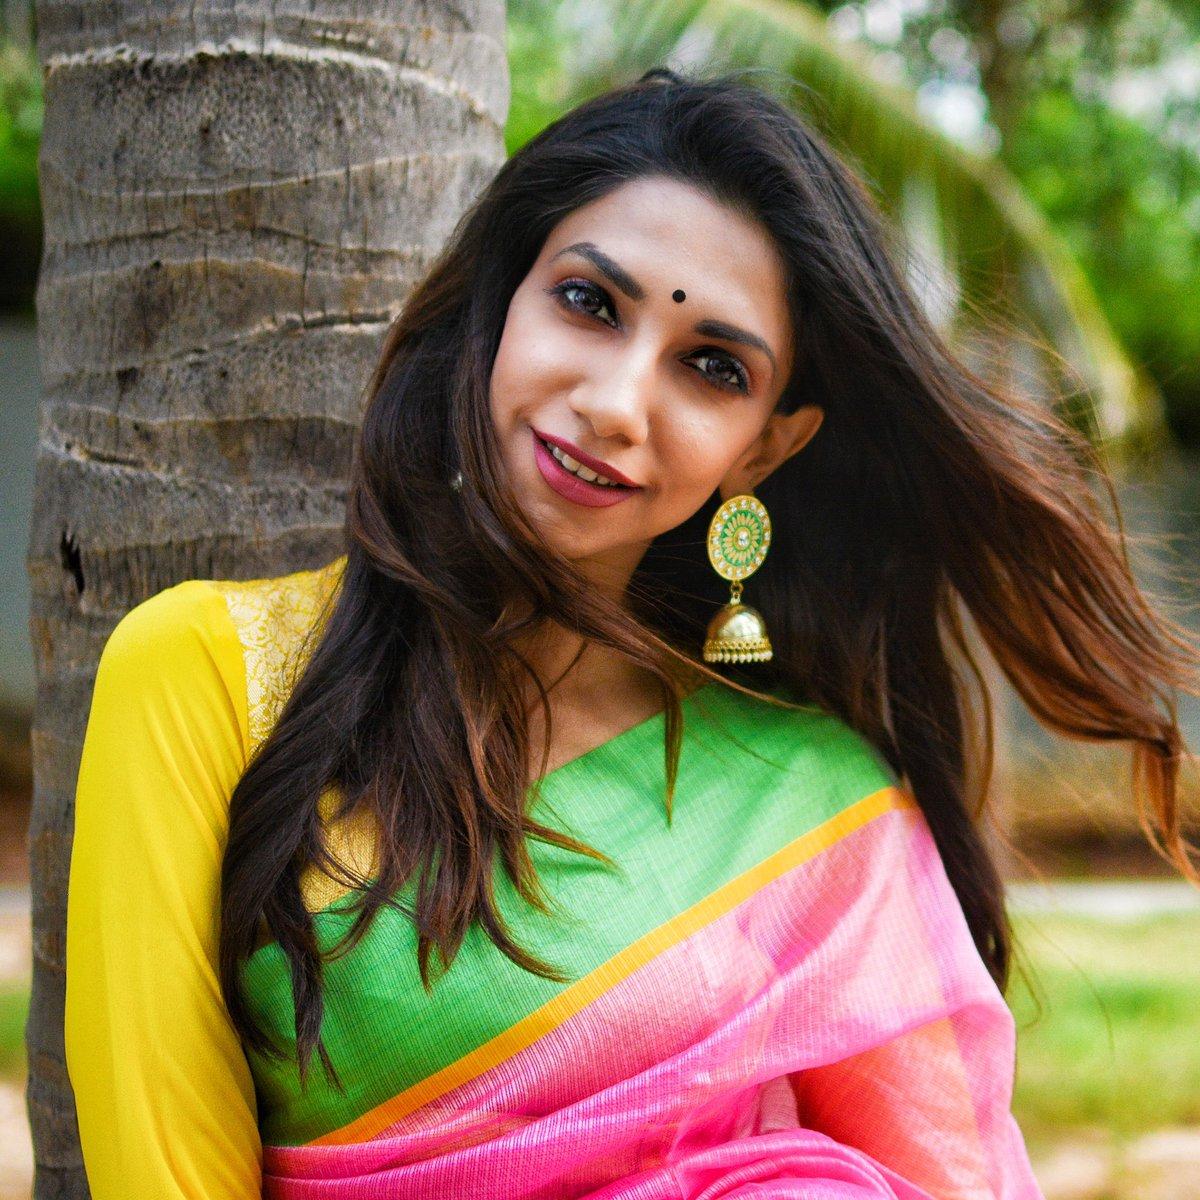 Svelte Diva @Bhavna__B #BhavnaVJ #VJBhavna #VijayTv #StarSportsTamil https://t.co/dFfOopBBjh